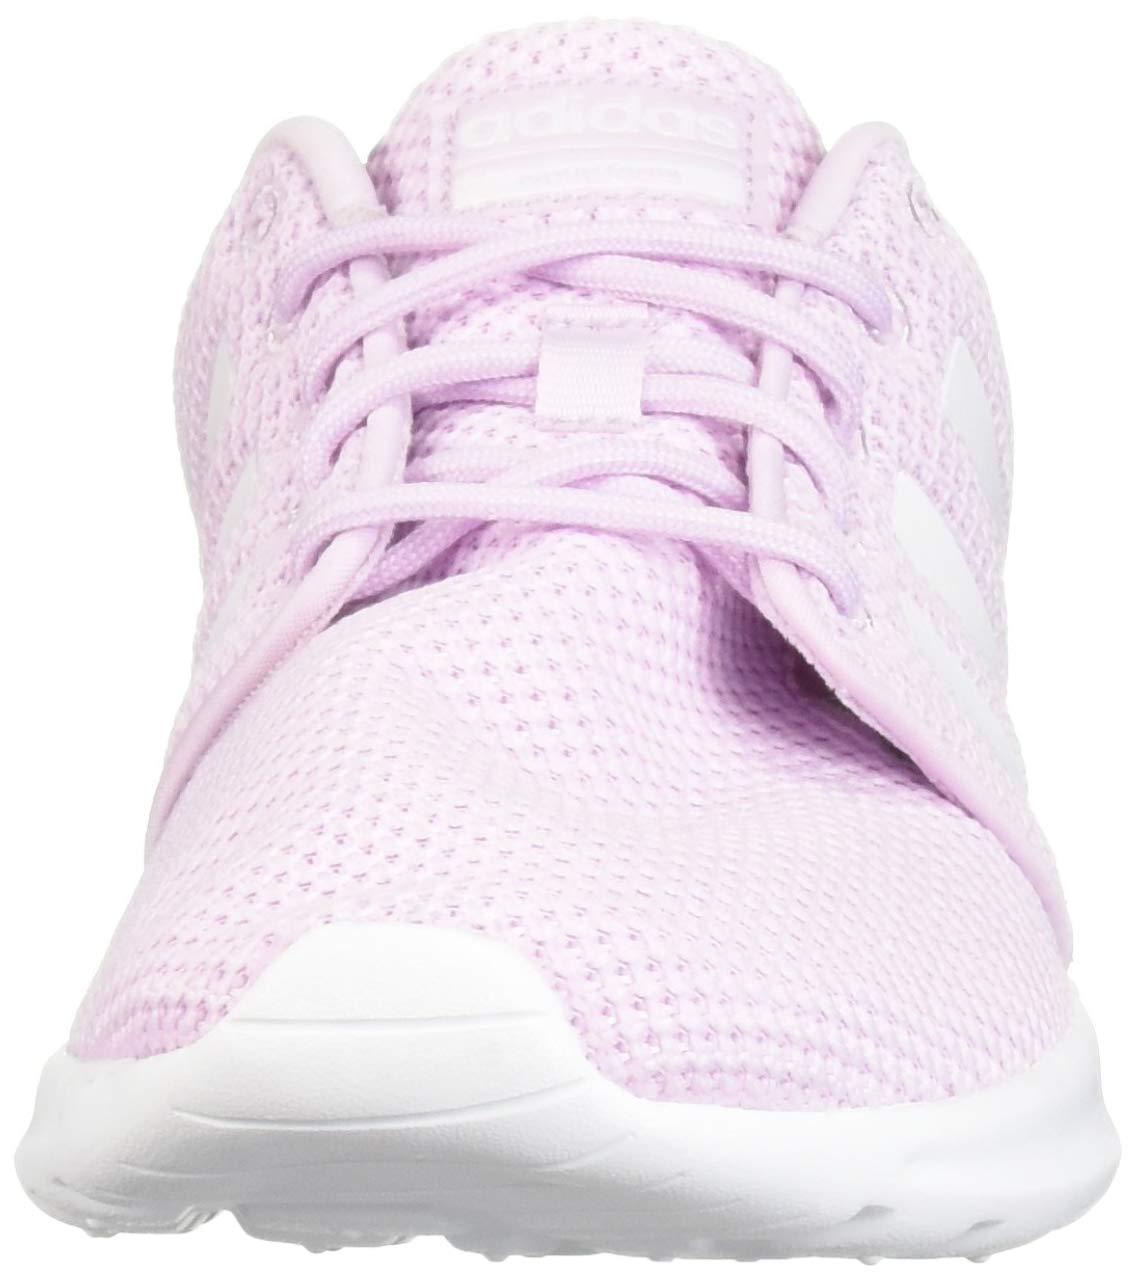 adidas Women's Cloudfoam QT Racer, White/aero Pink, 5.5 M US by adidas (Image #4)